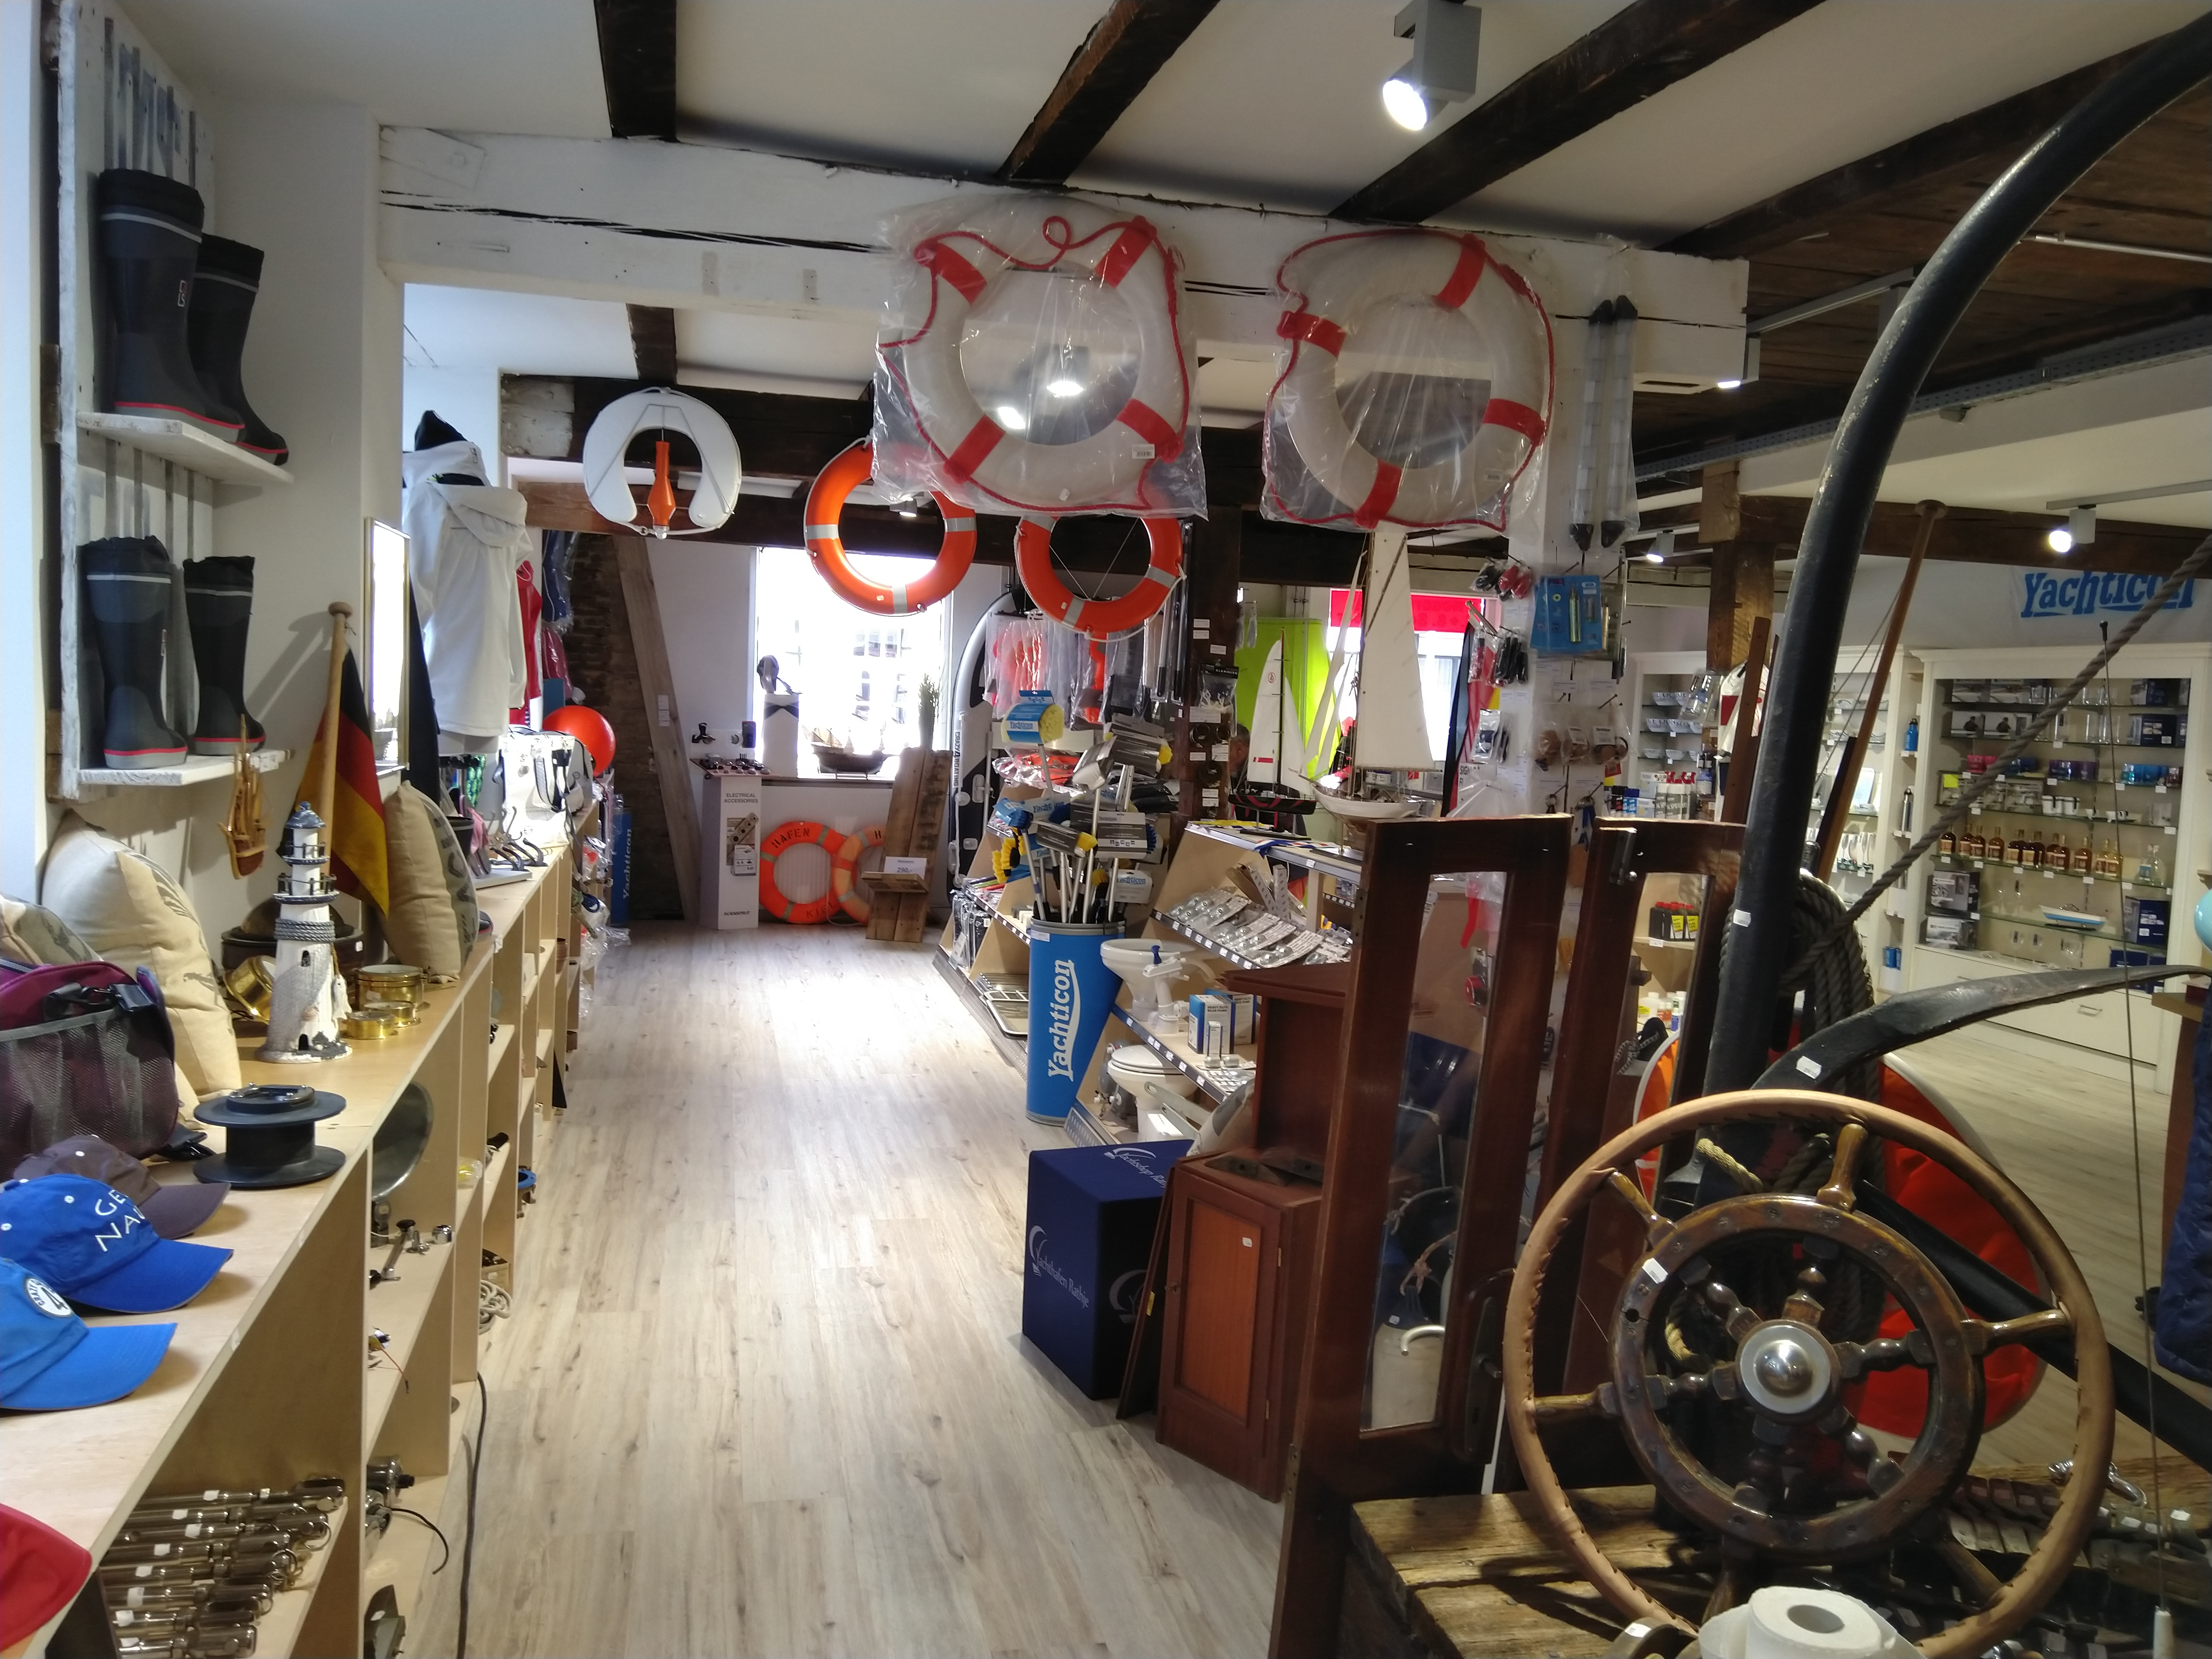 Blick in den Verkaufsraum im Yachtshop Rathje in Kiel